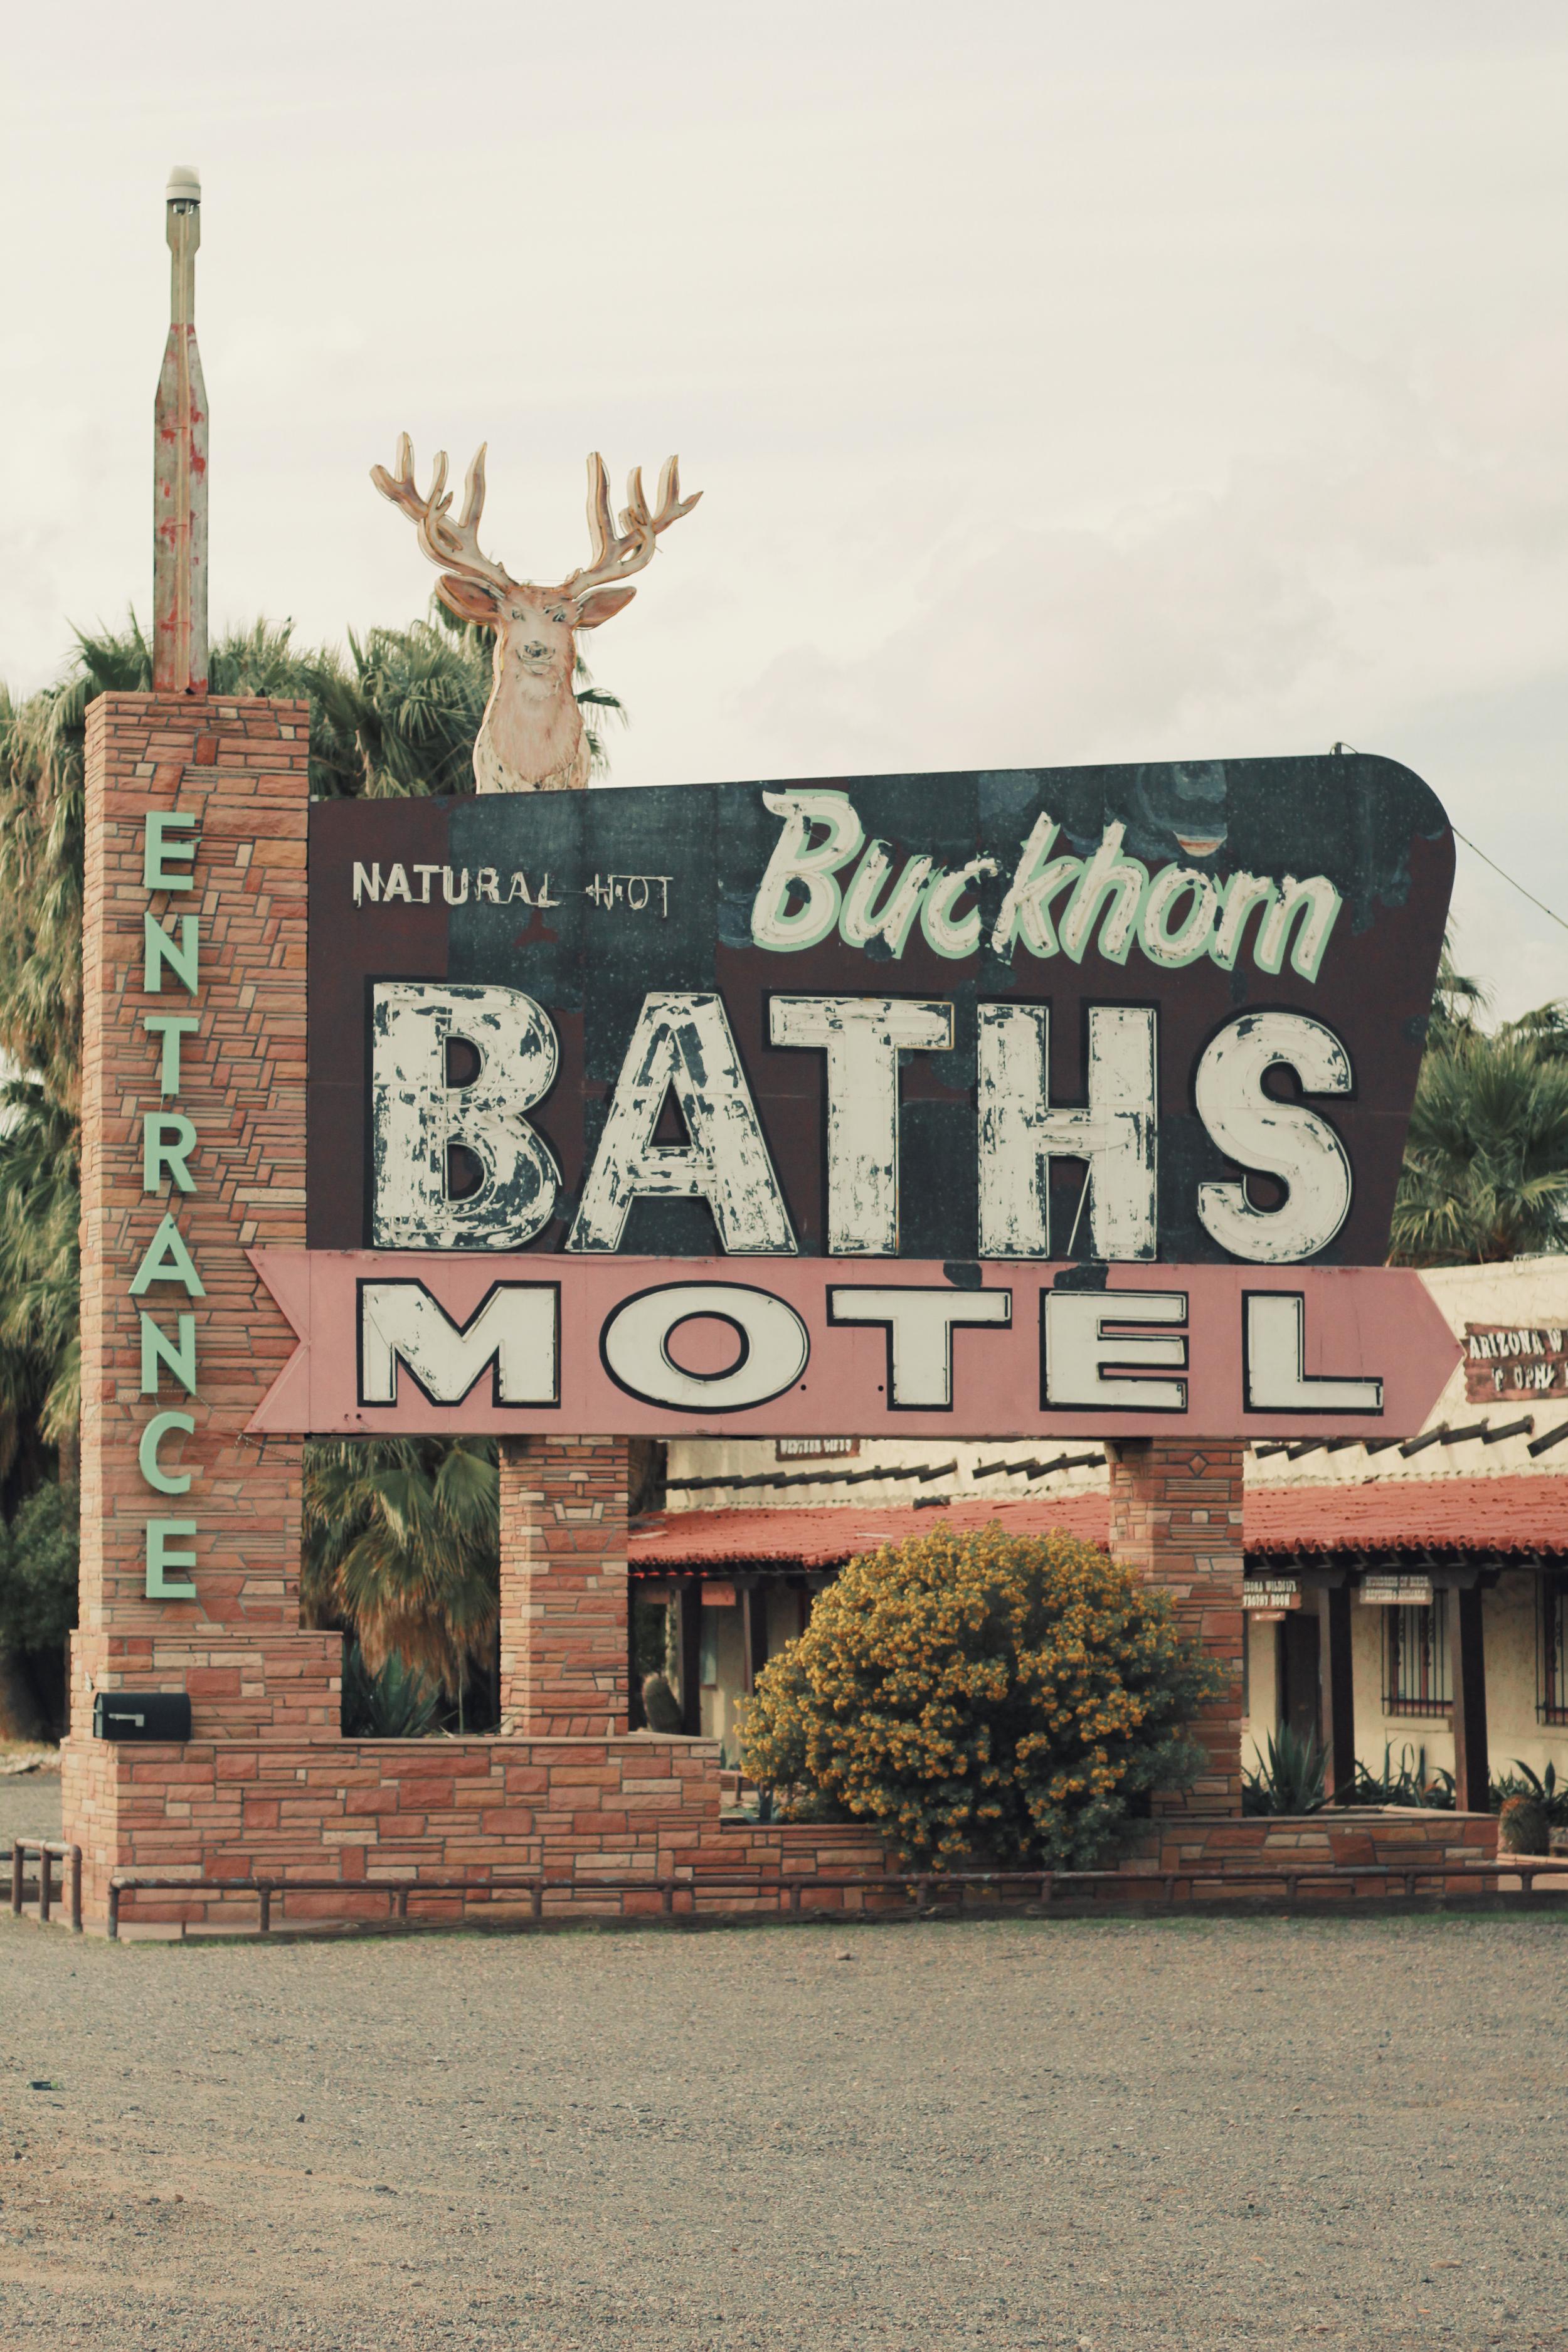 Buckhorn Baths Motel.jpg